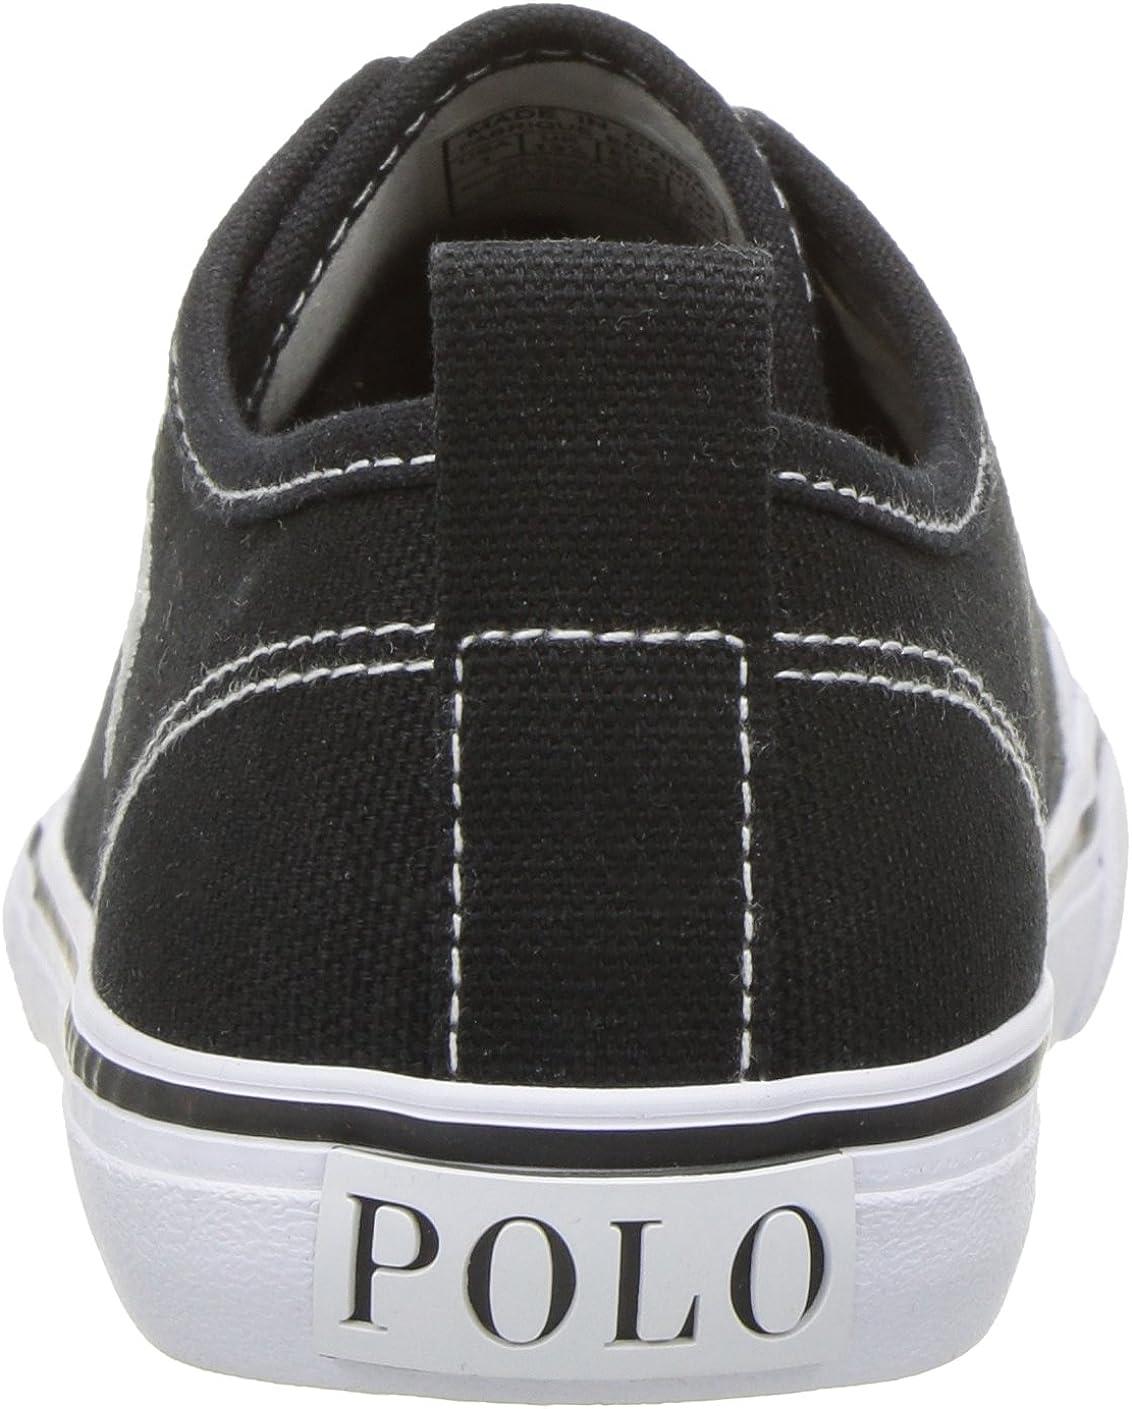 Polo Ralph Lauren Kids Carlin Sneaker